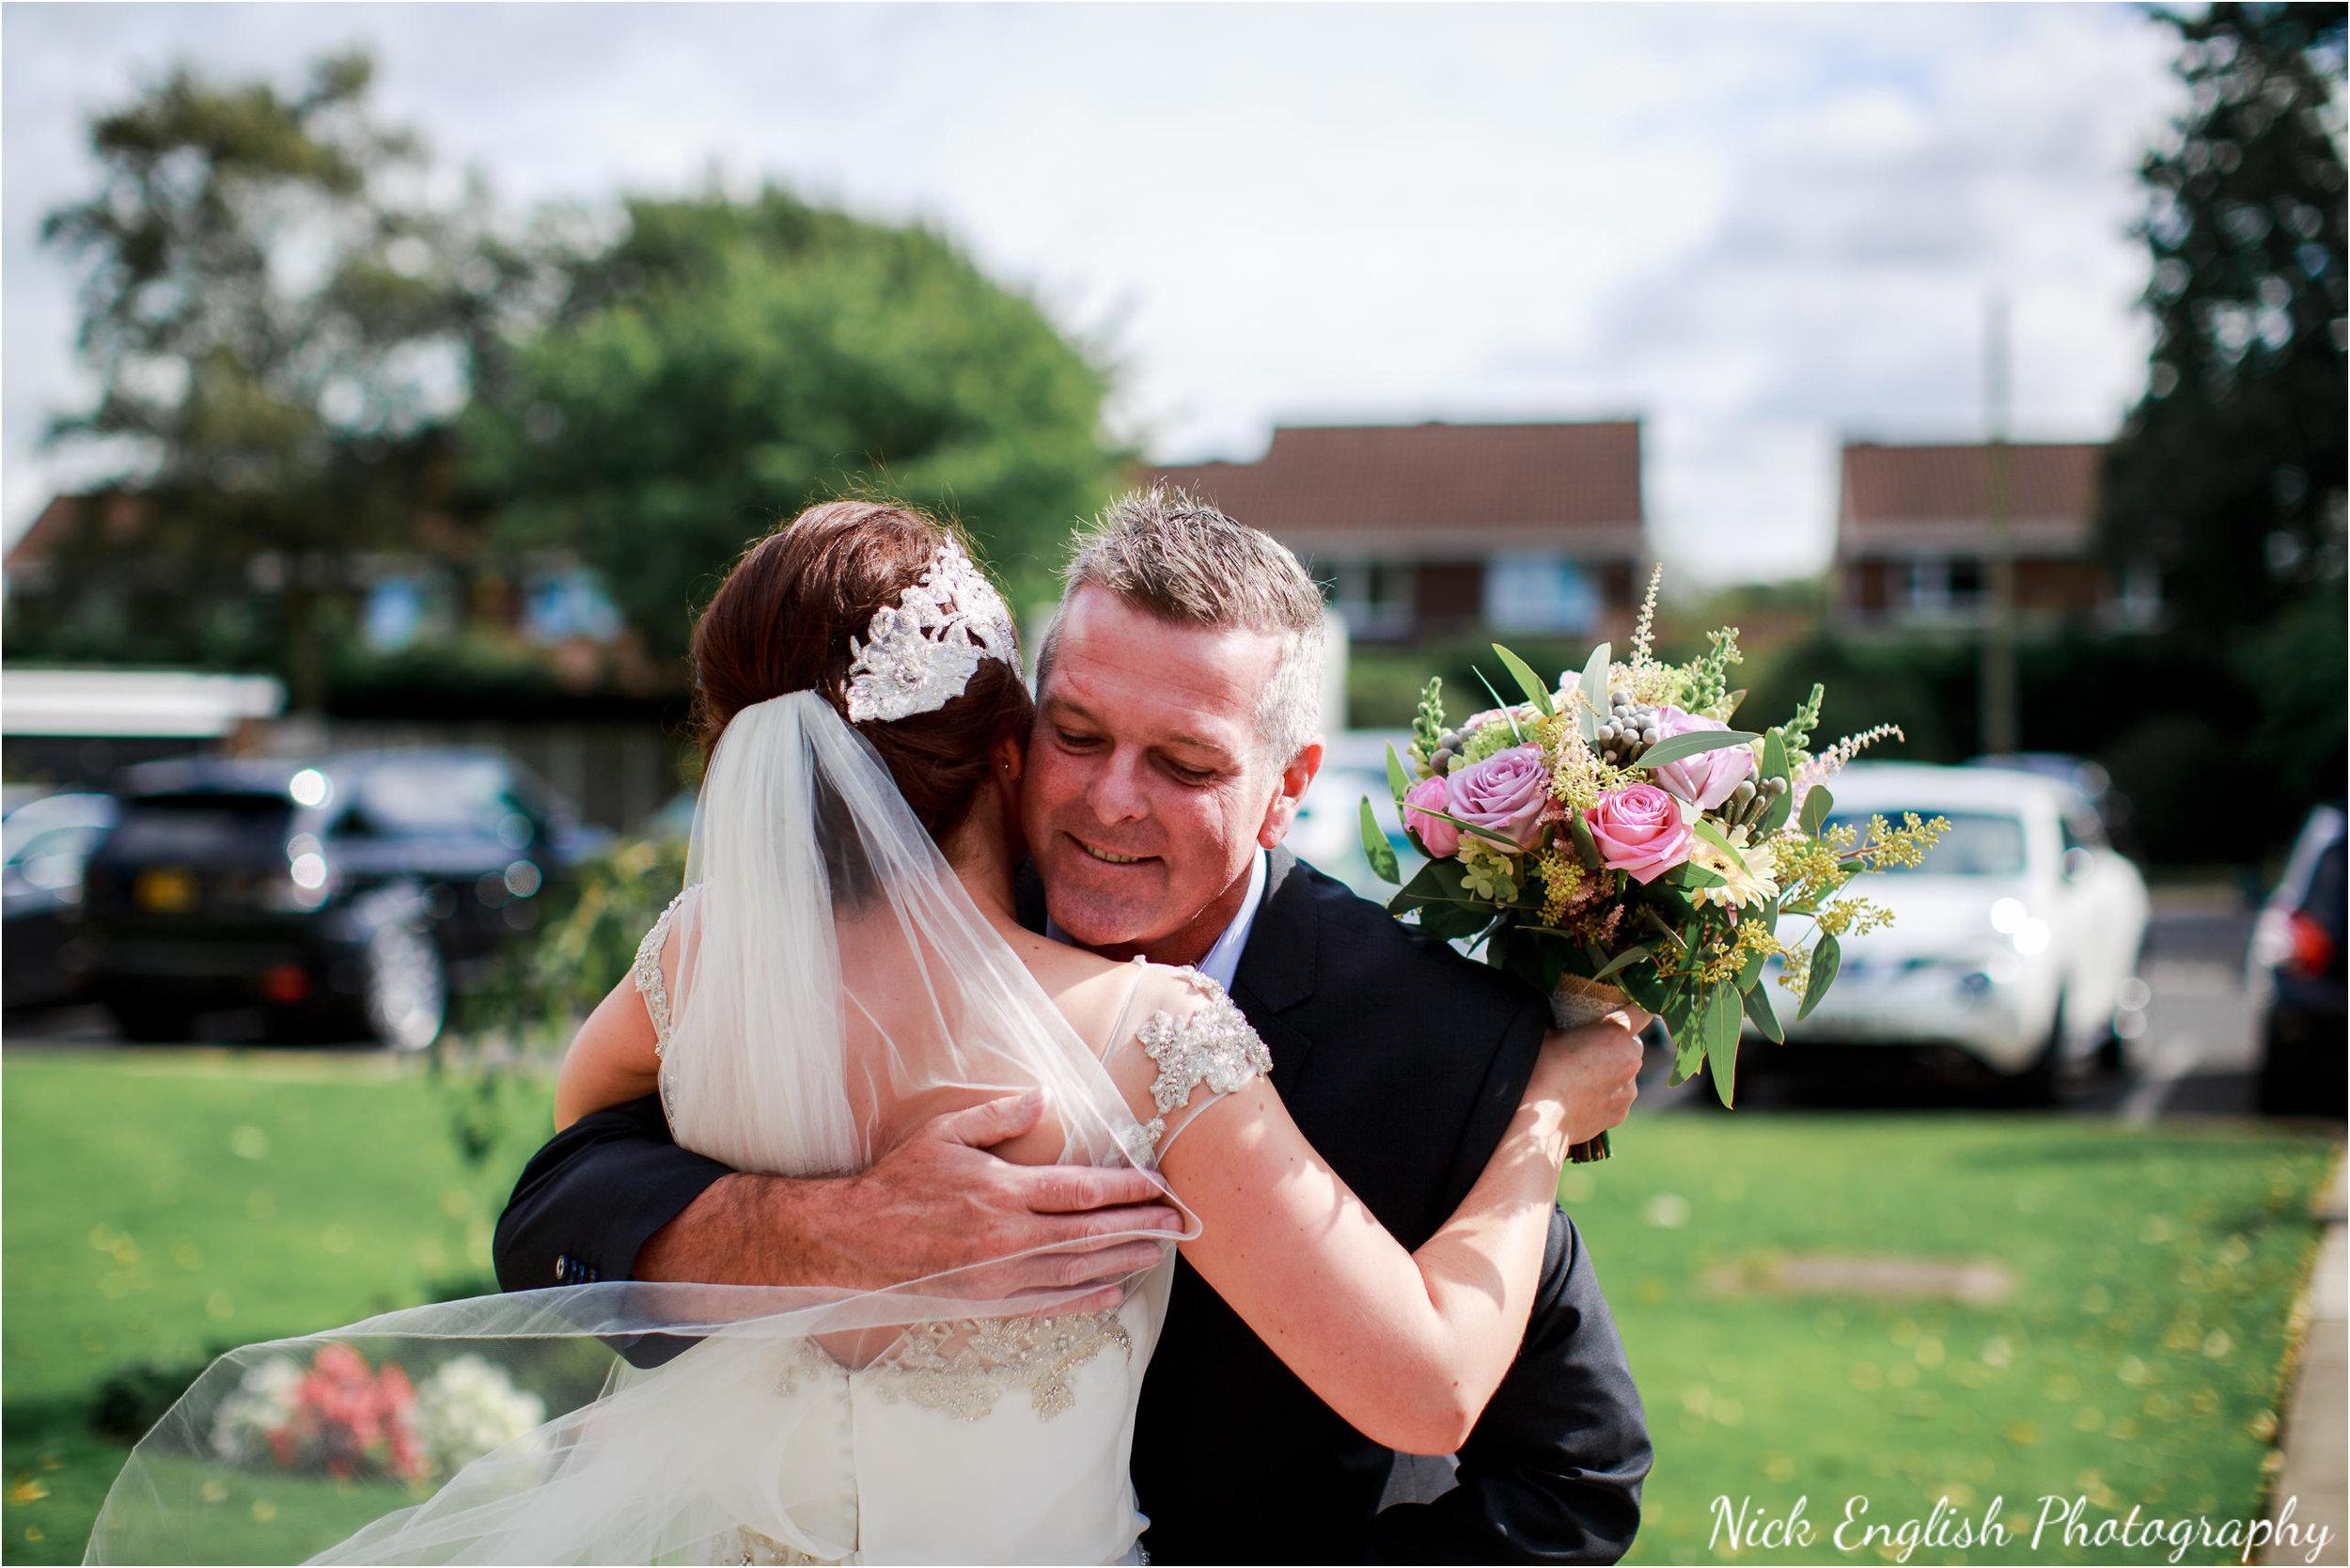 Stacey-Ash-Wedding-Photographs-Stanley-House-Preston-Lancashire-86.jpg